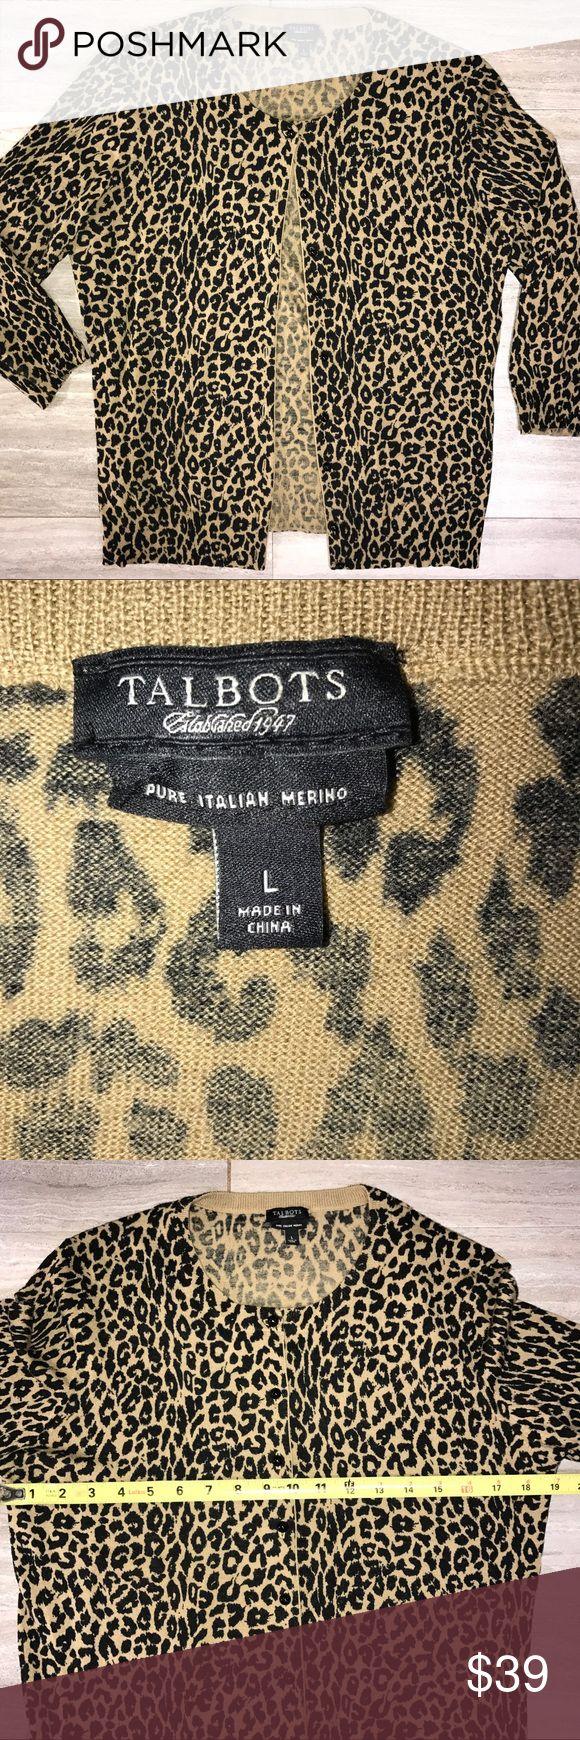 Talbots Merino Wool Cheetah Cardigan Black Tan Talbots lightweight 100% Italian merino wool buttondown cardigan sweater. Tan with black cheetah print. Great condition. Talbots Sweaters Crew & Scoop Necks